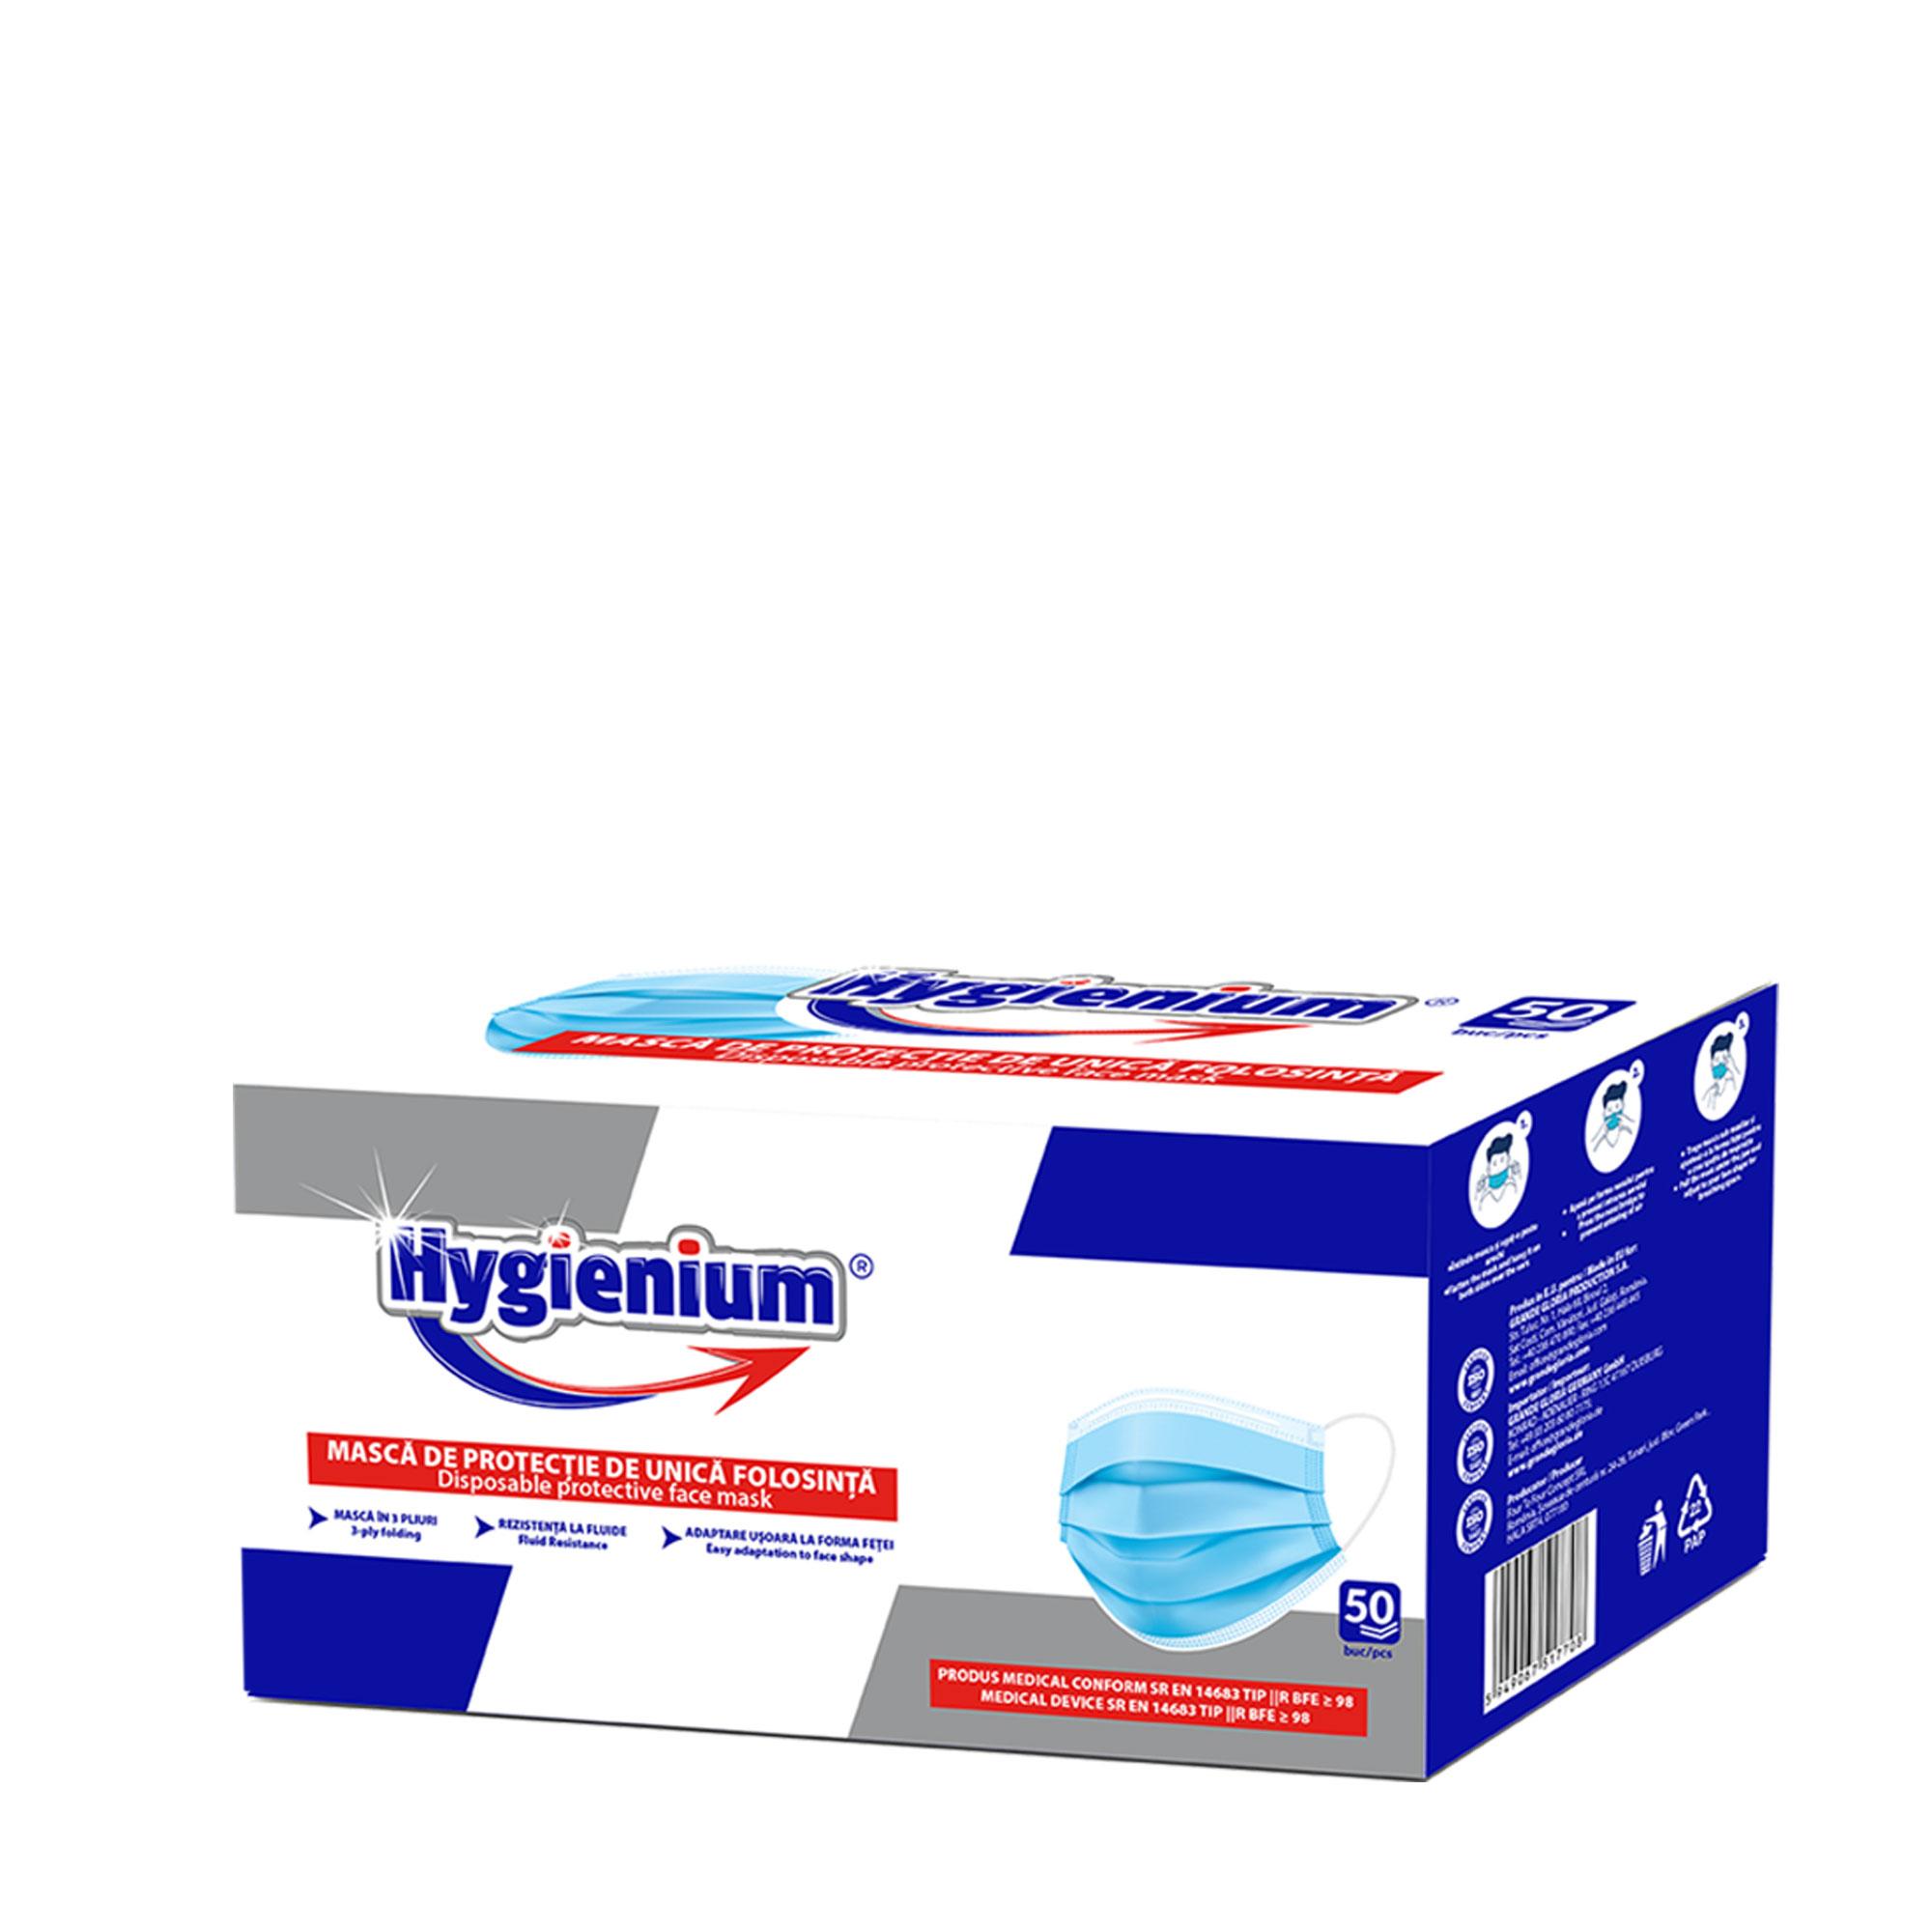 Hygienium Masti de Unica Folosinta 50 pcs box